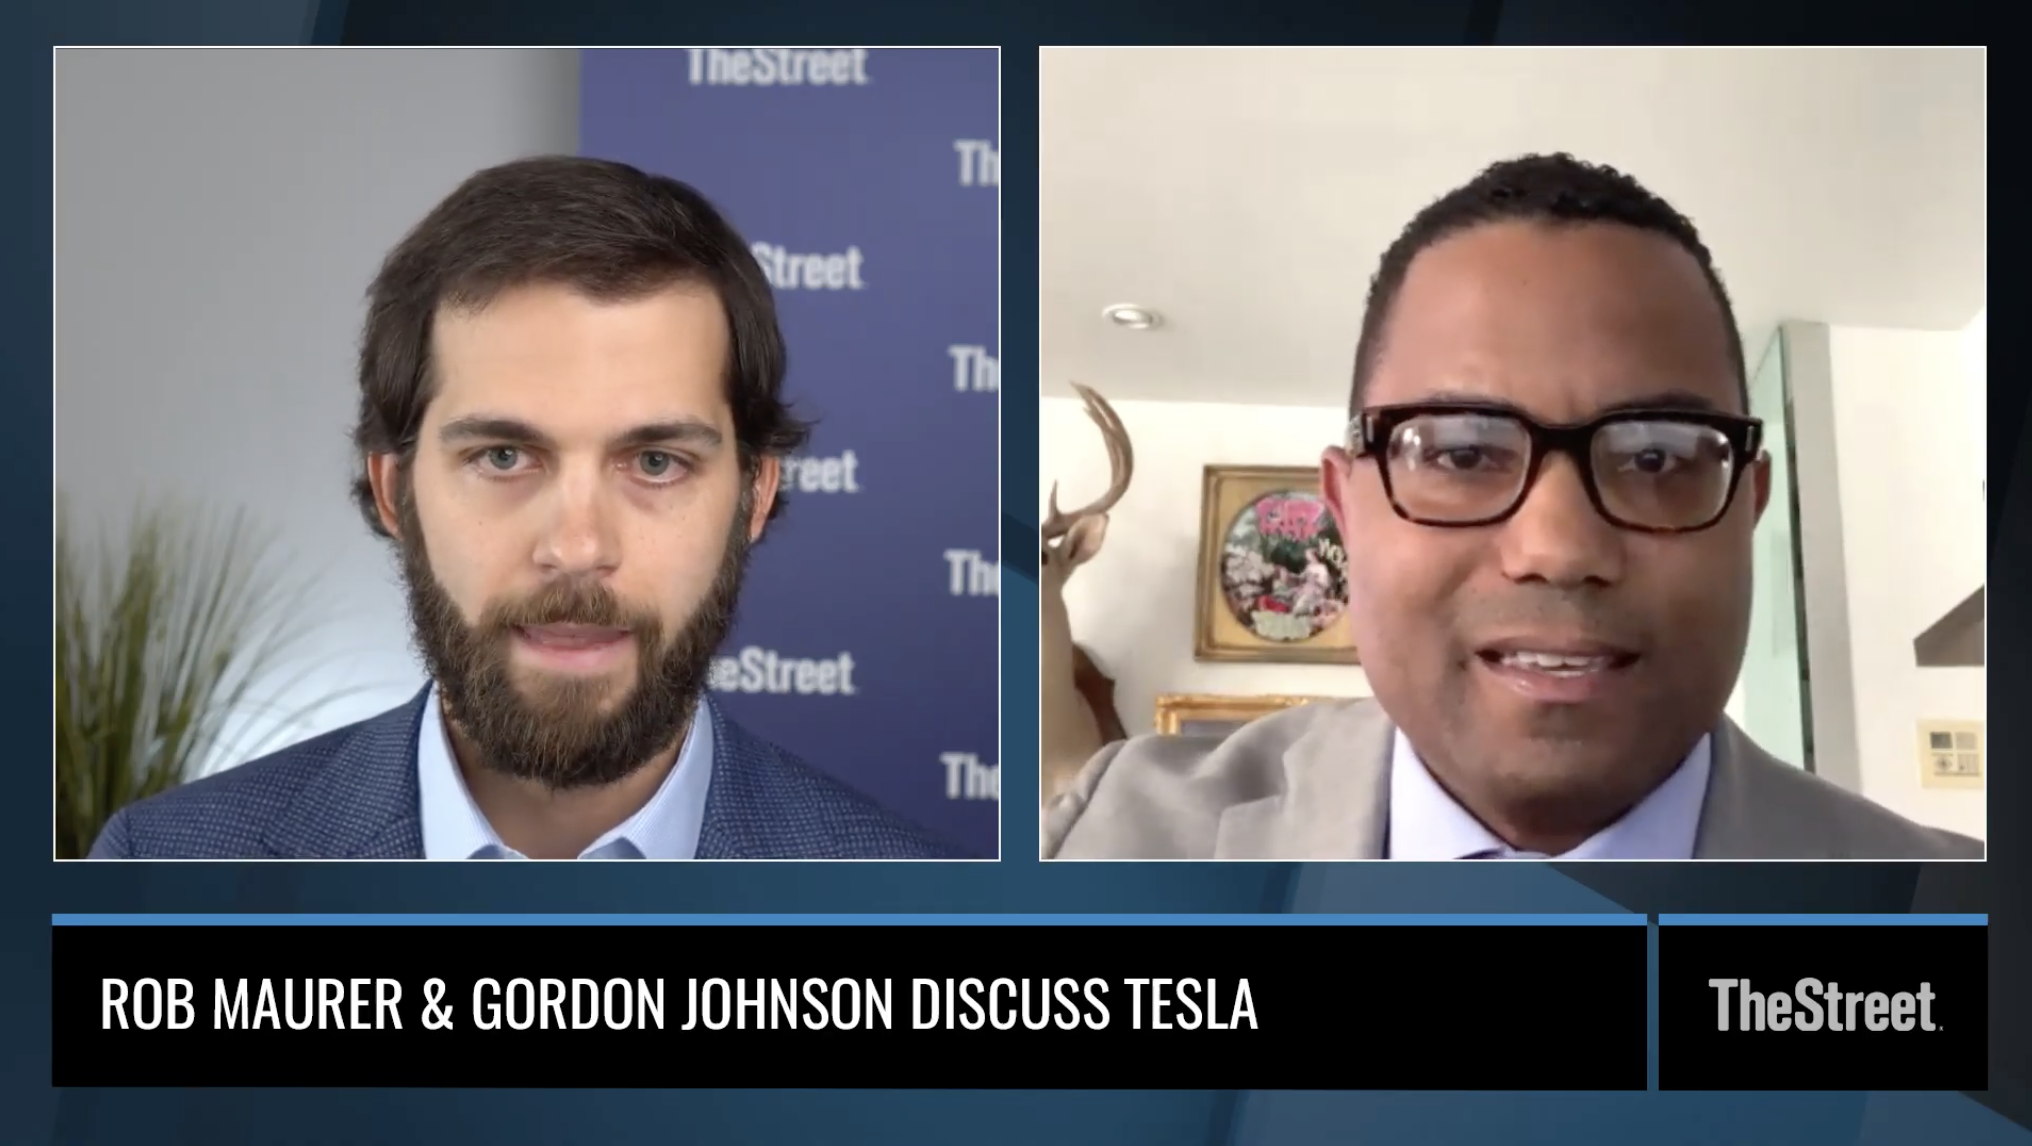 tesla-gordon-johnson-tech-lead-debate-rob-maurer